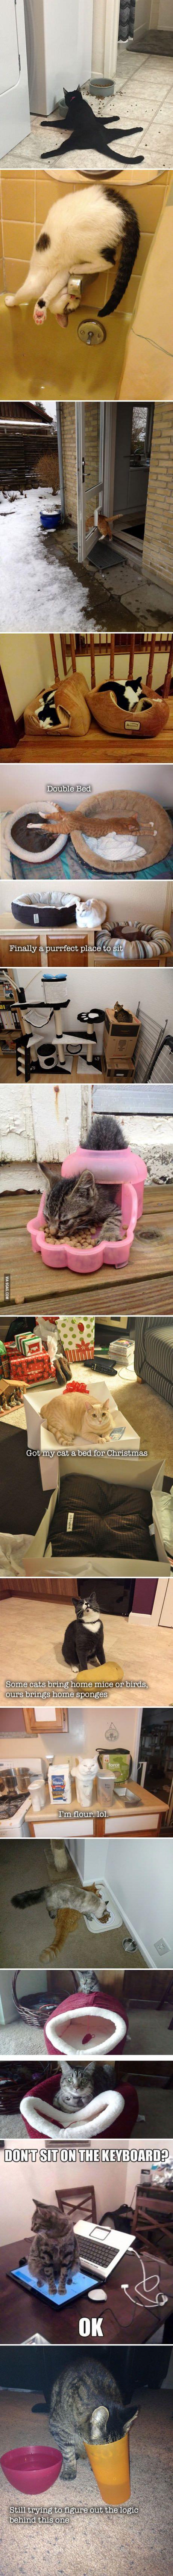 Cat Logic!